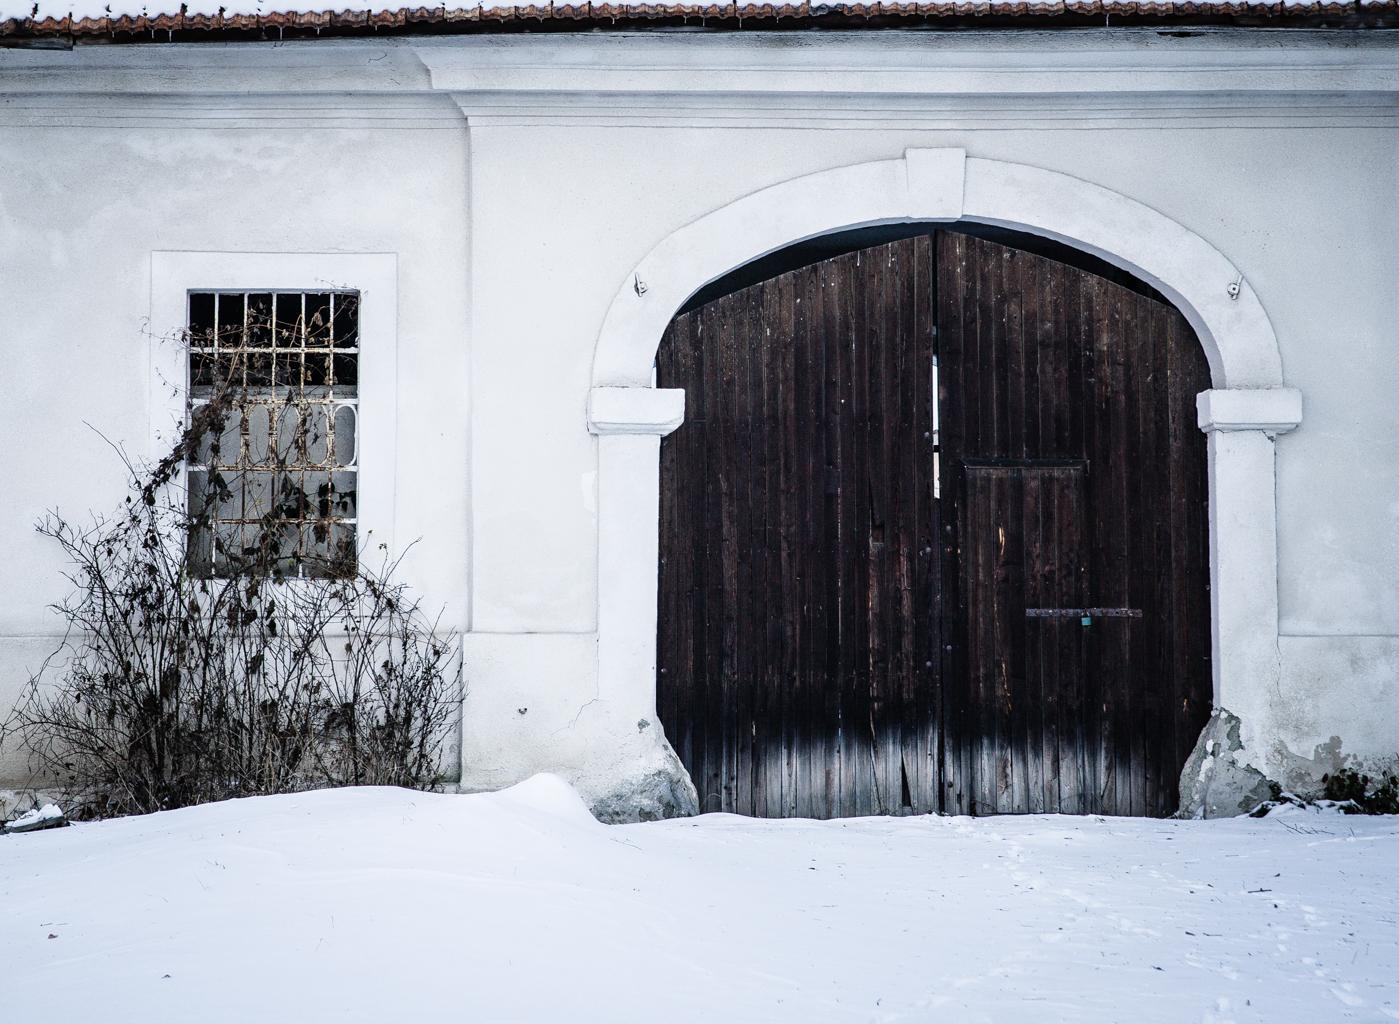 winter-1-of-7